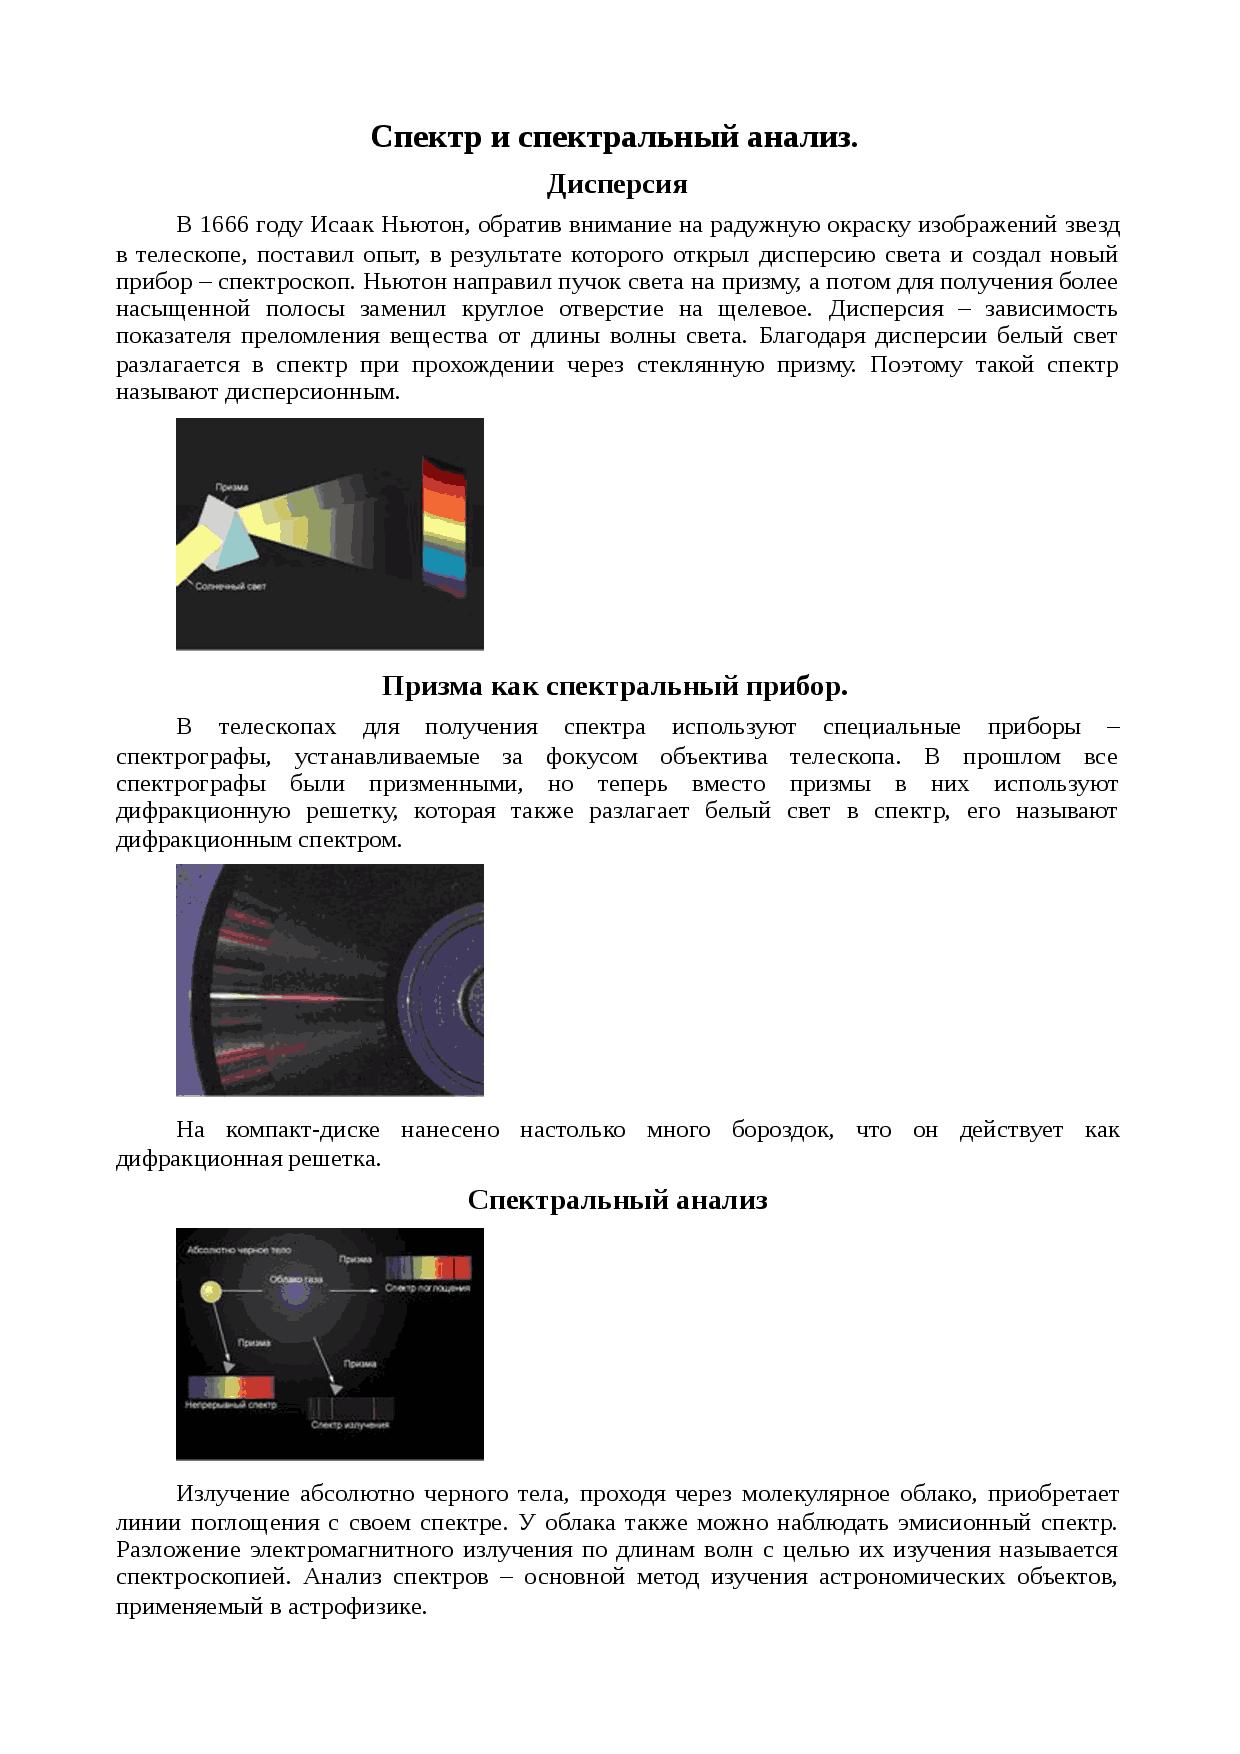 Prosound.ixbt.com